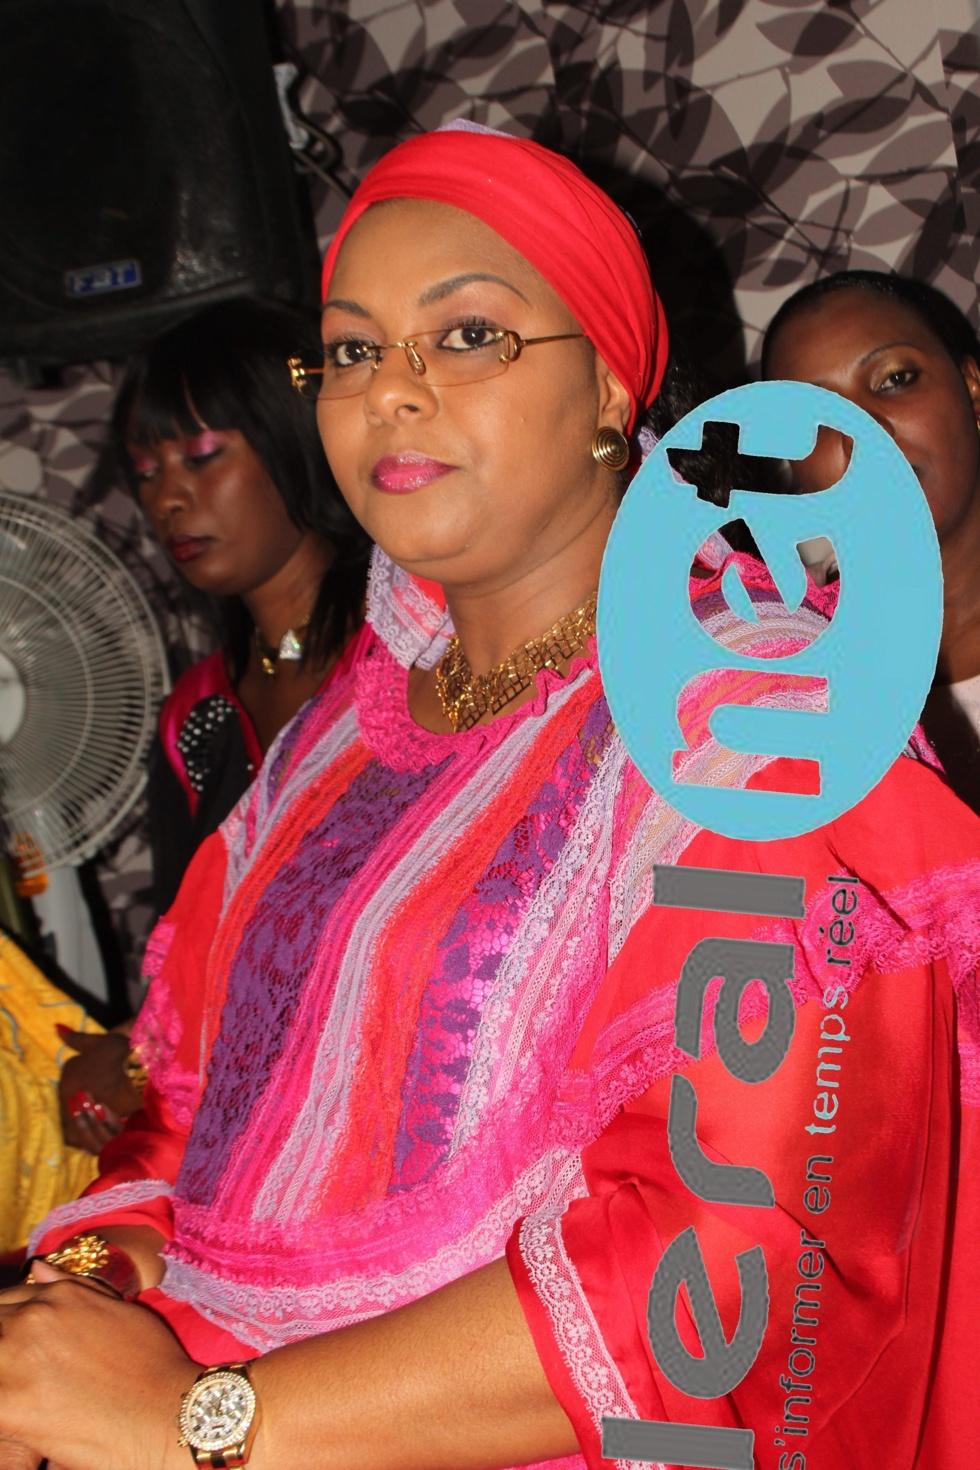 Une épouse de Serigne Modou Kara